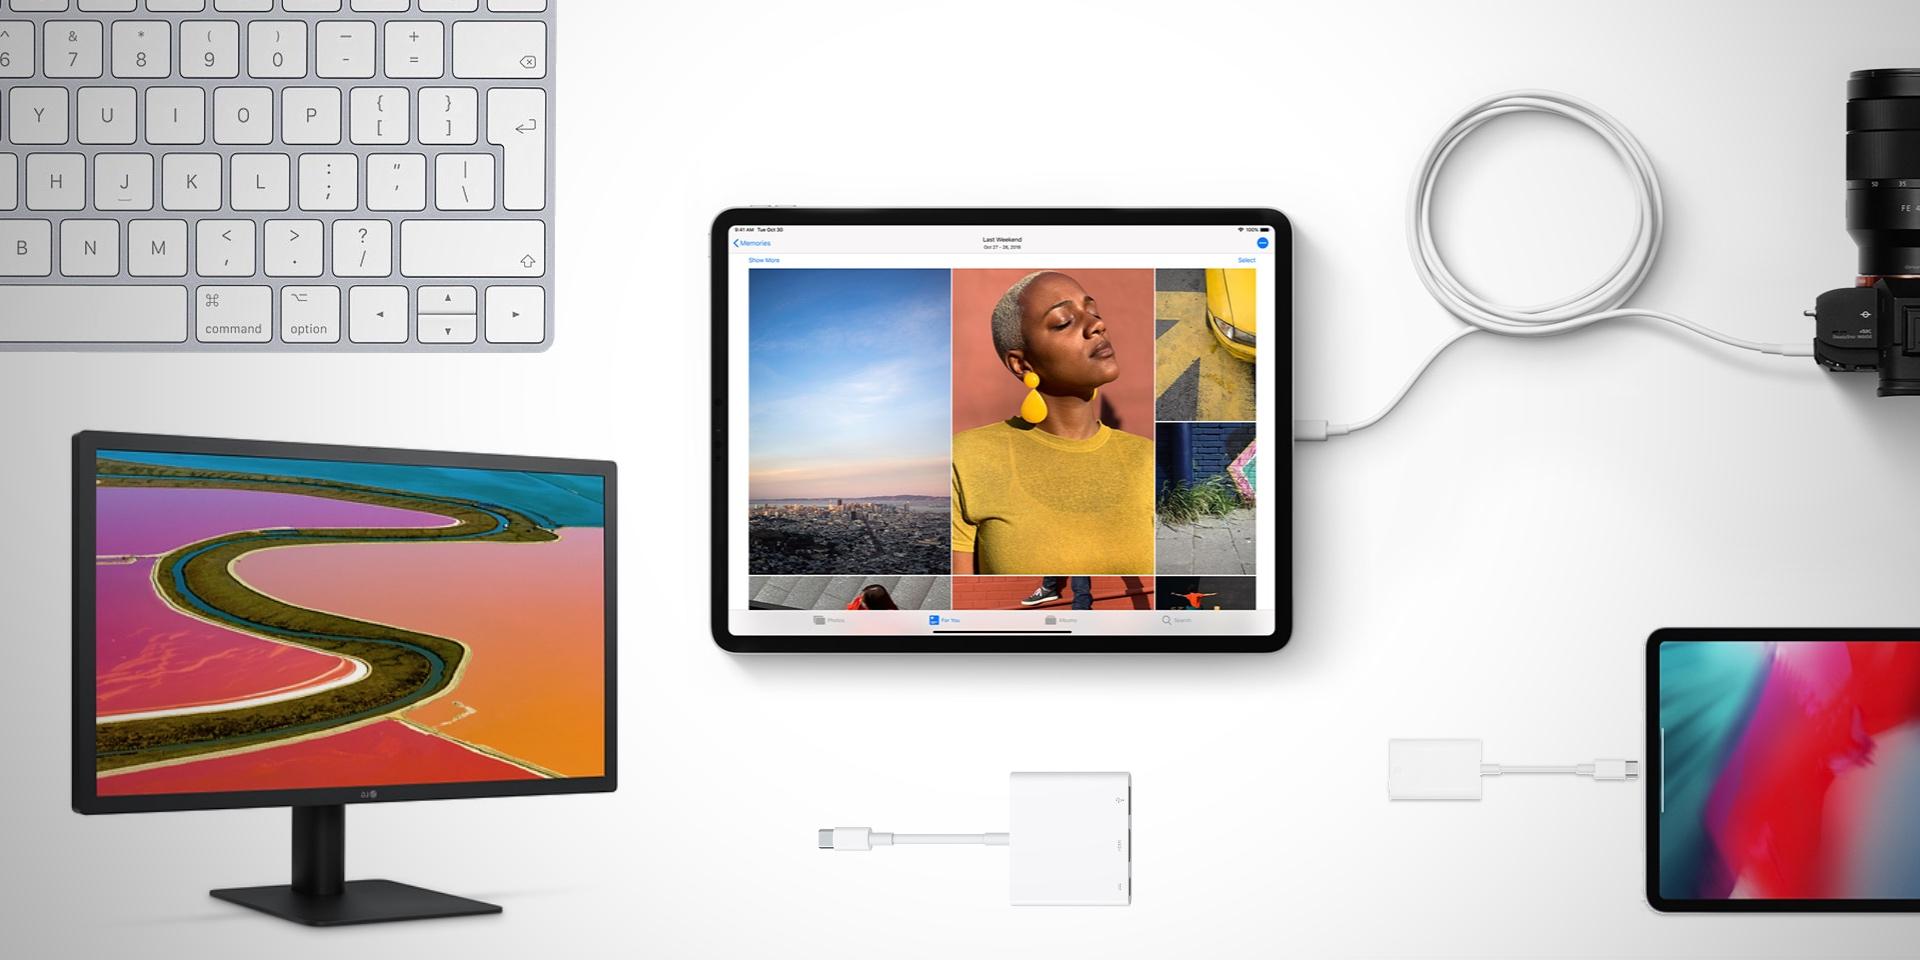 How to cancel icloud storage on macbook pro